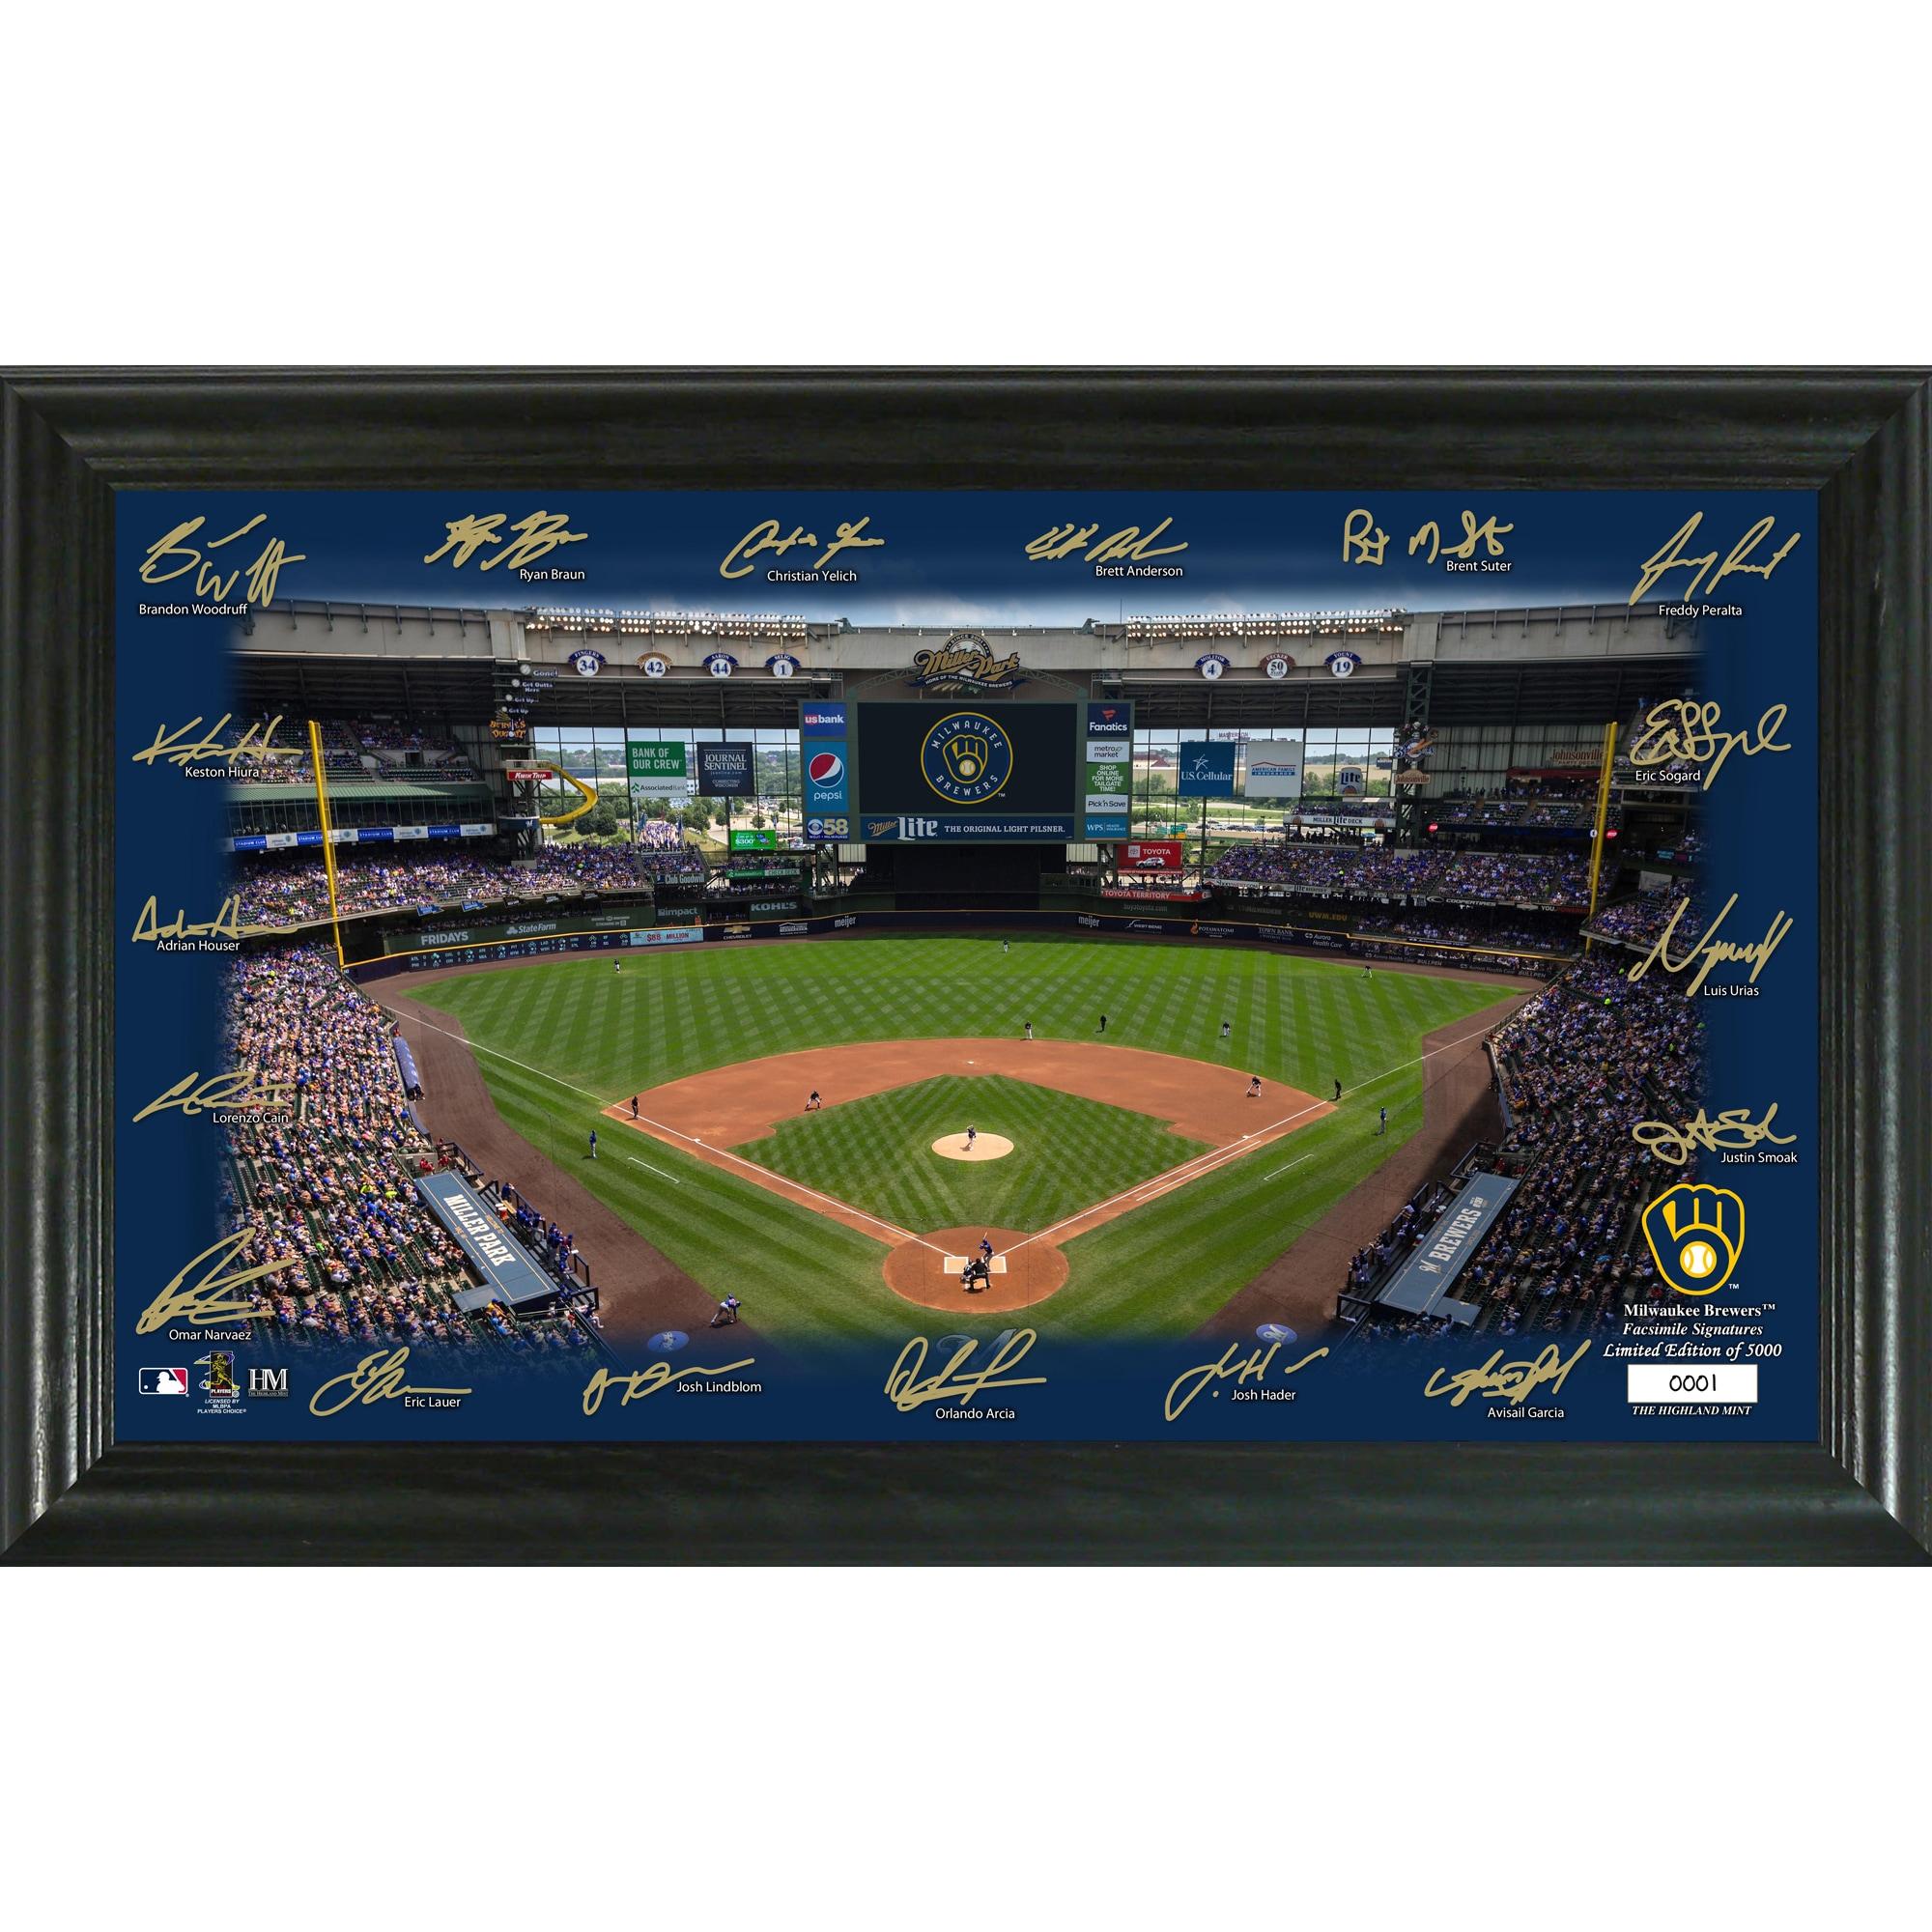 Milwaukee Brewers Highland Mint 12'' x 20'' Signature Field Limited Editon Framed Photo Mint